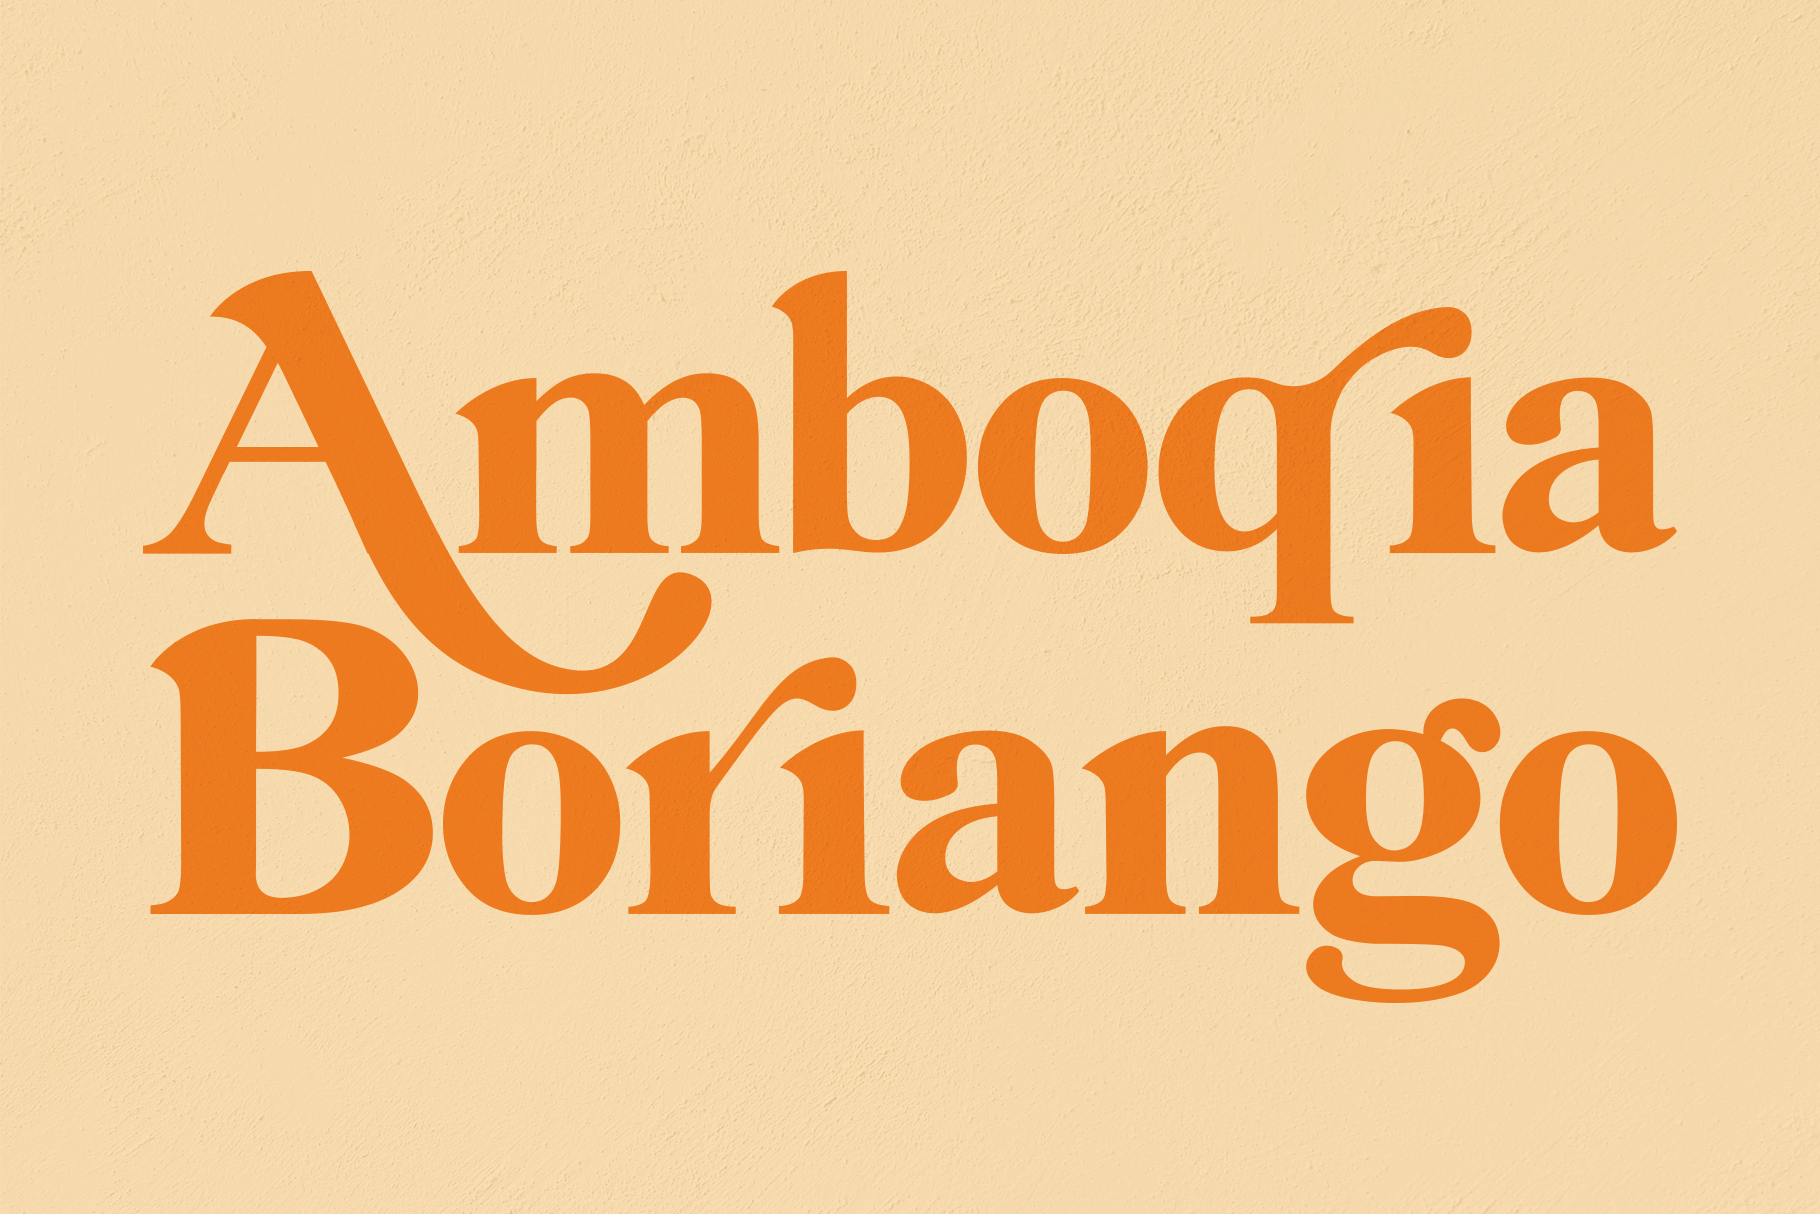 Amboqia Boriango